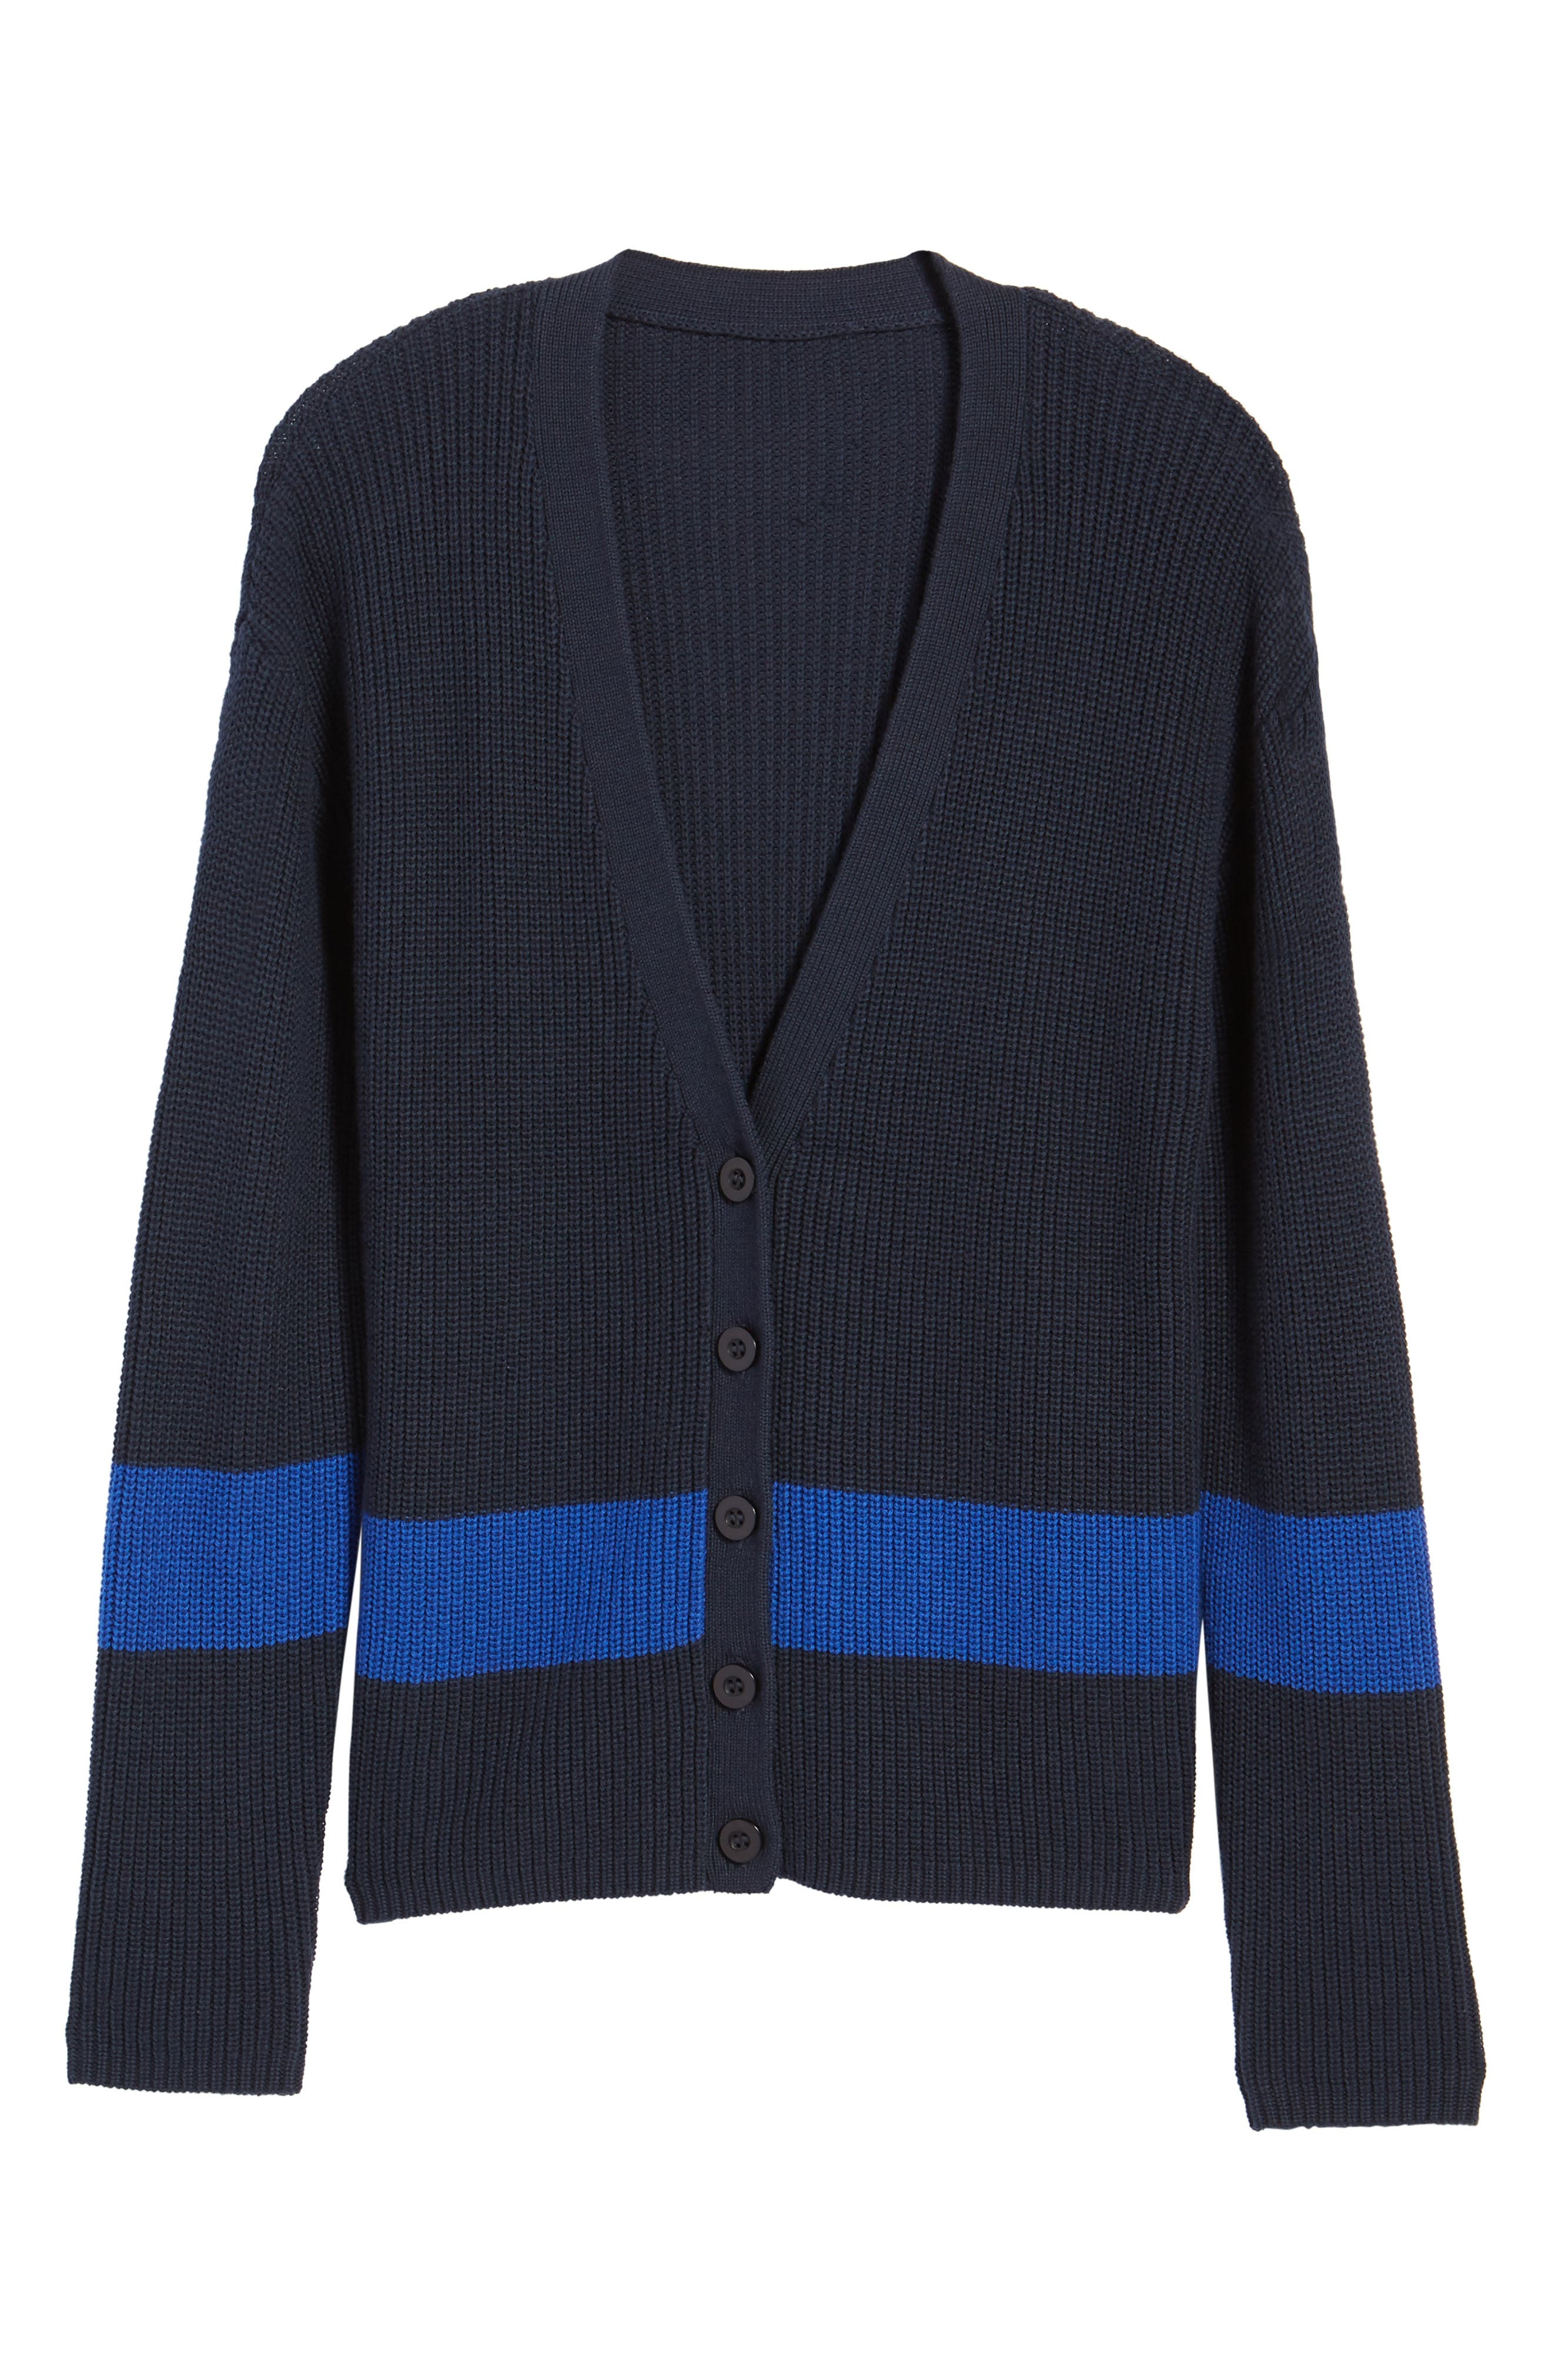 Shaker Knit Cardigan,                             Alternate thumbnail 7, color,                             Navy- Blue Colorblock